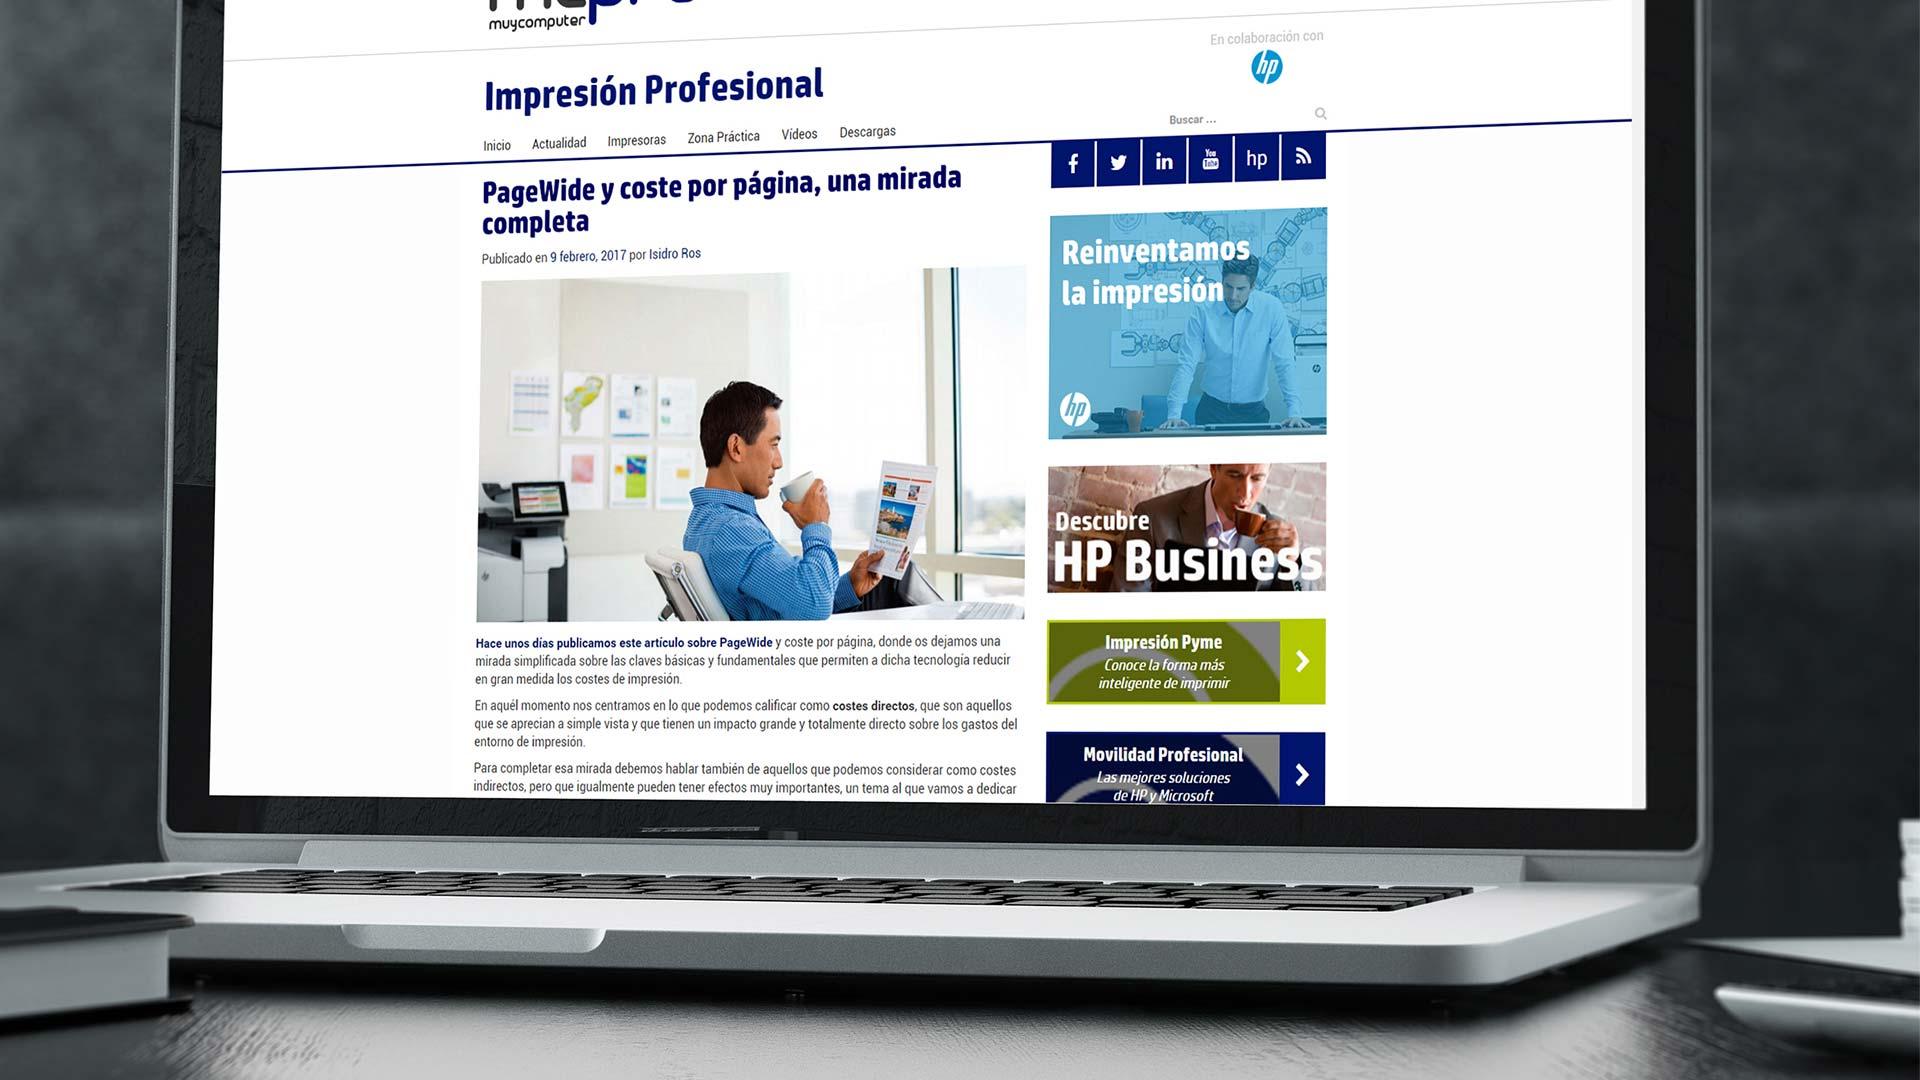 zona-patrocinada-content-marketing-hp-impresion_profesional_07